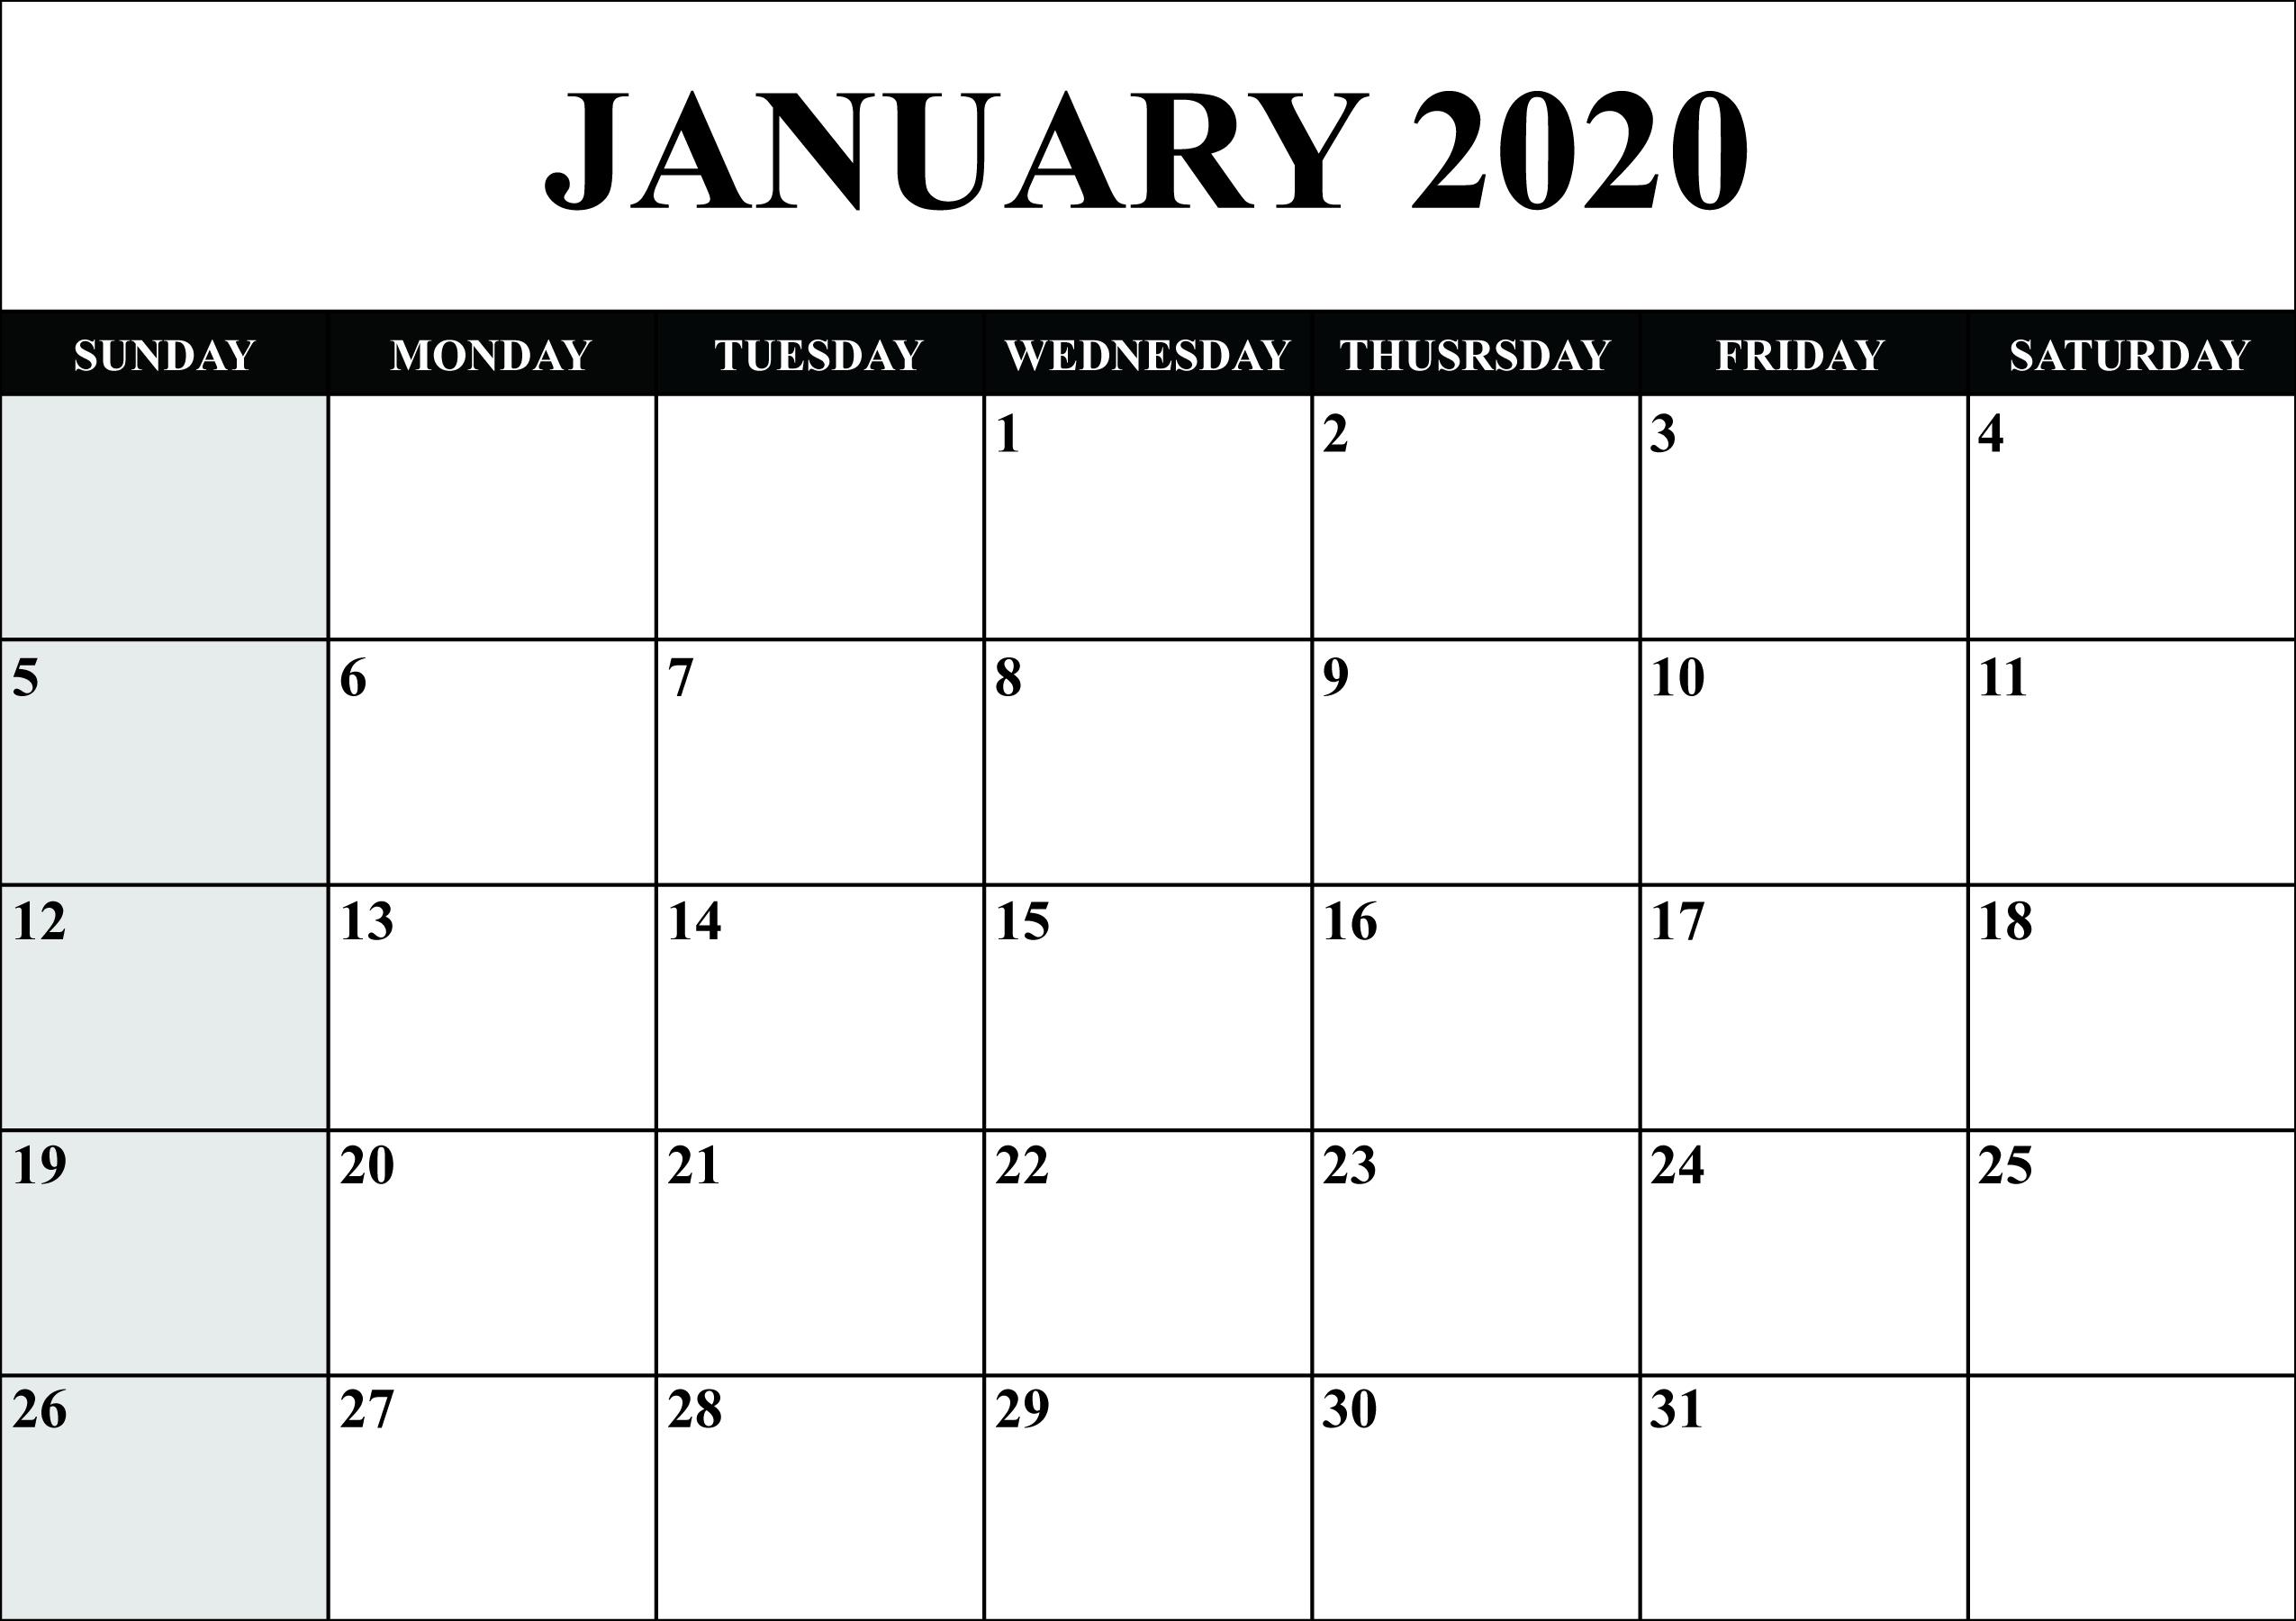 January Calendar Printable - Hd Football